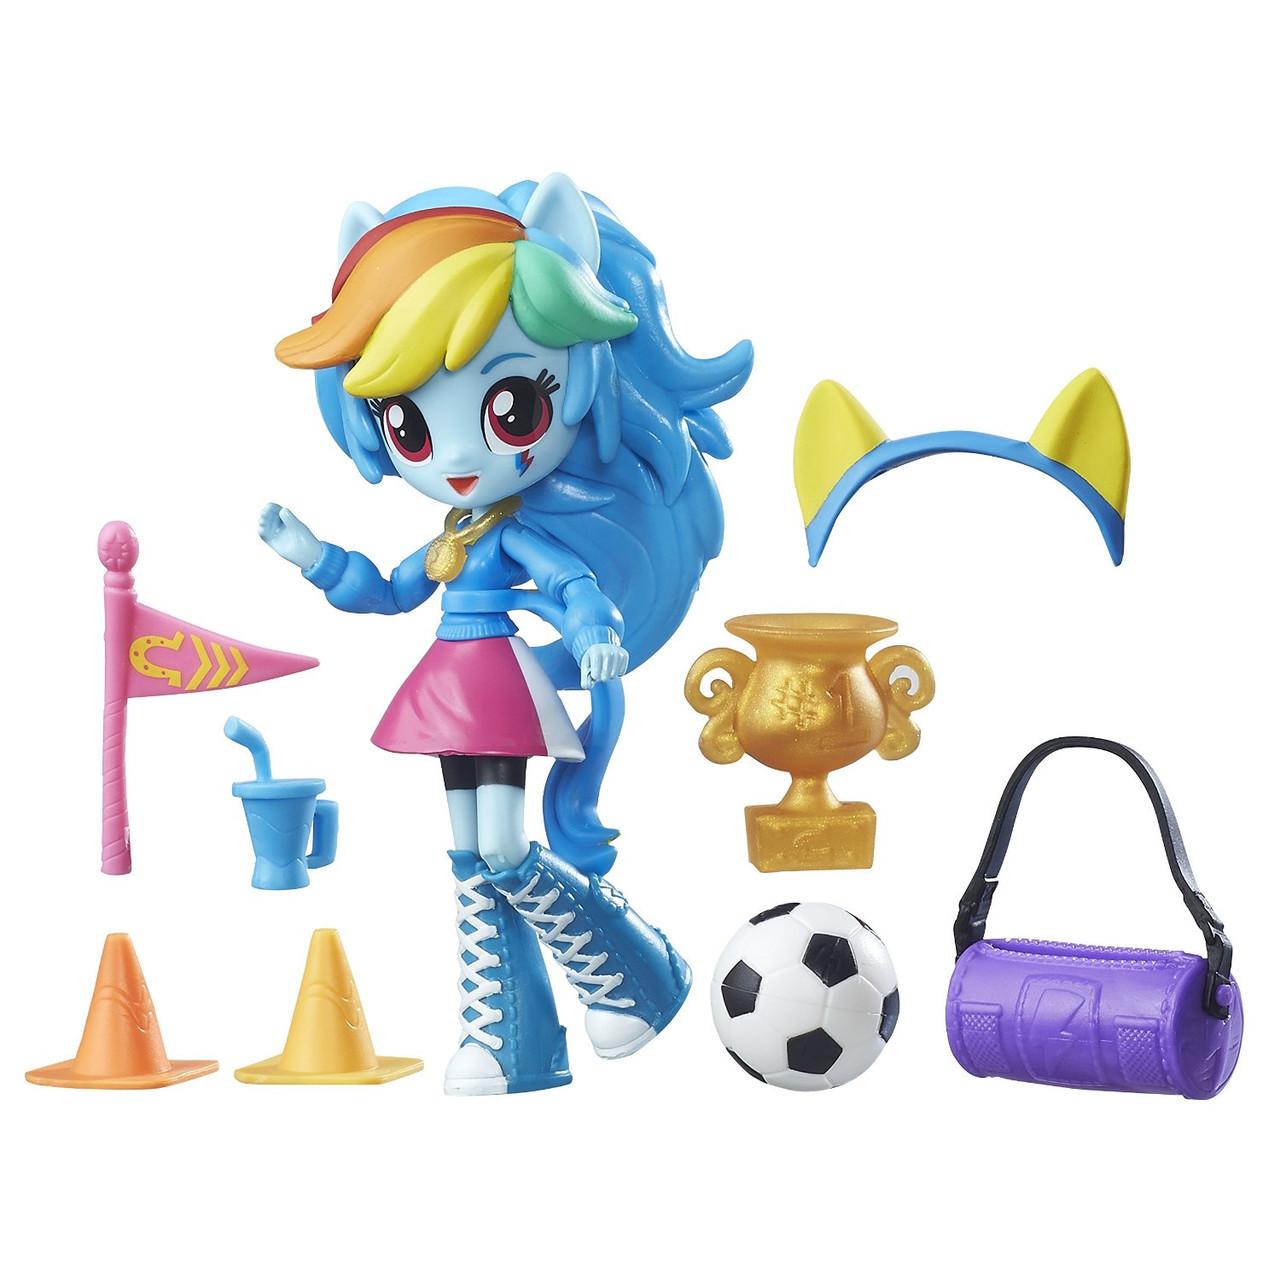 Кукла Май Литл Пони Рэйнбоу Дэш мини My Little Pony Equestria Girls Minis Rainbow Dash School Pep Rally